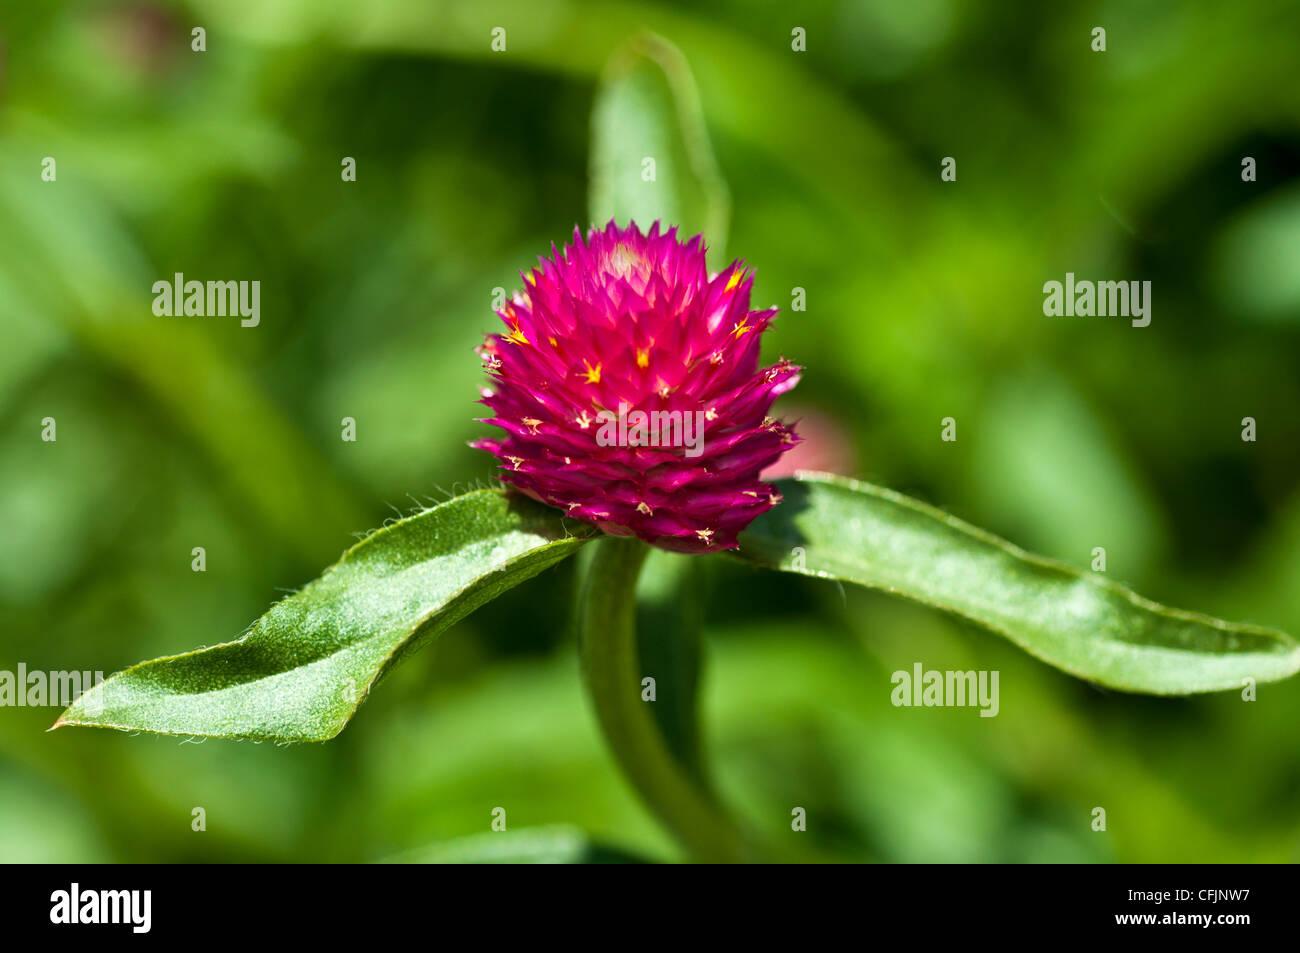 Red Globe fiore di amaranto close up Amaranthaceae Gomphrena globosa America Tropicale Immagini Stock